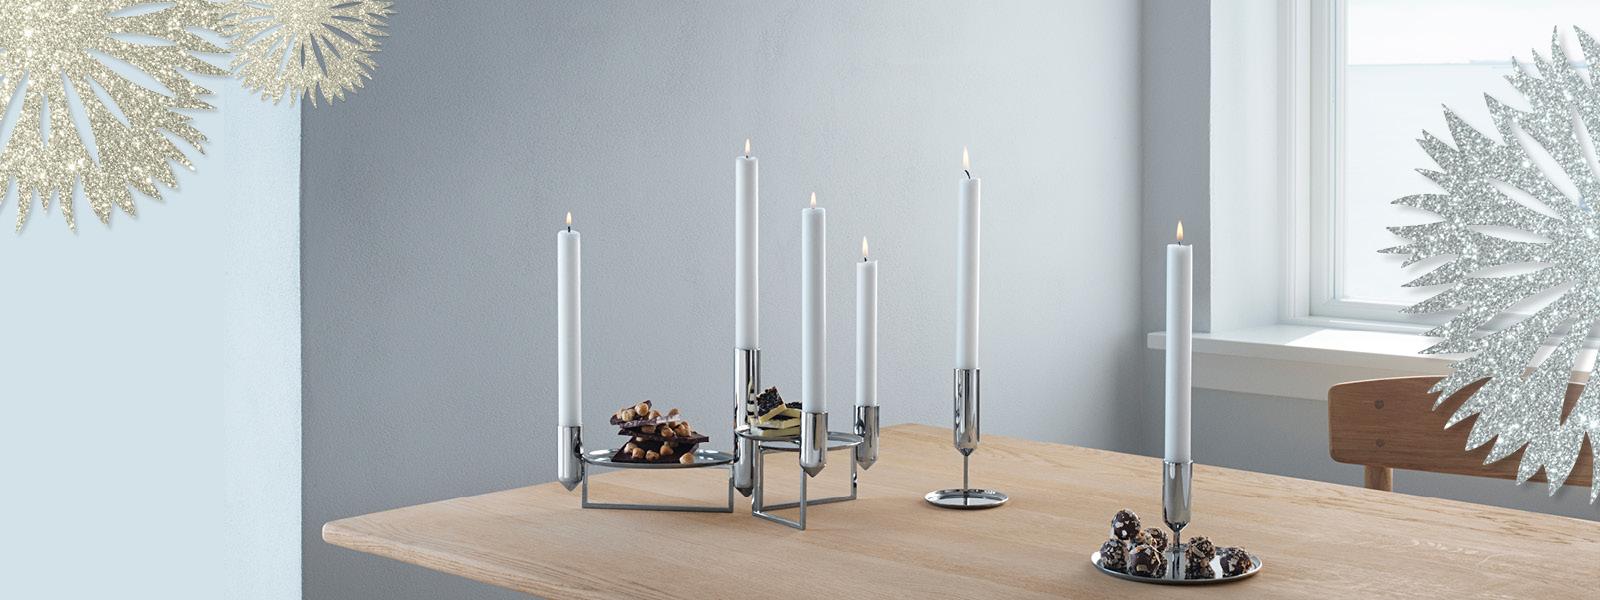 Georg Jensen Christmas Tree Candle Holders 2021